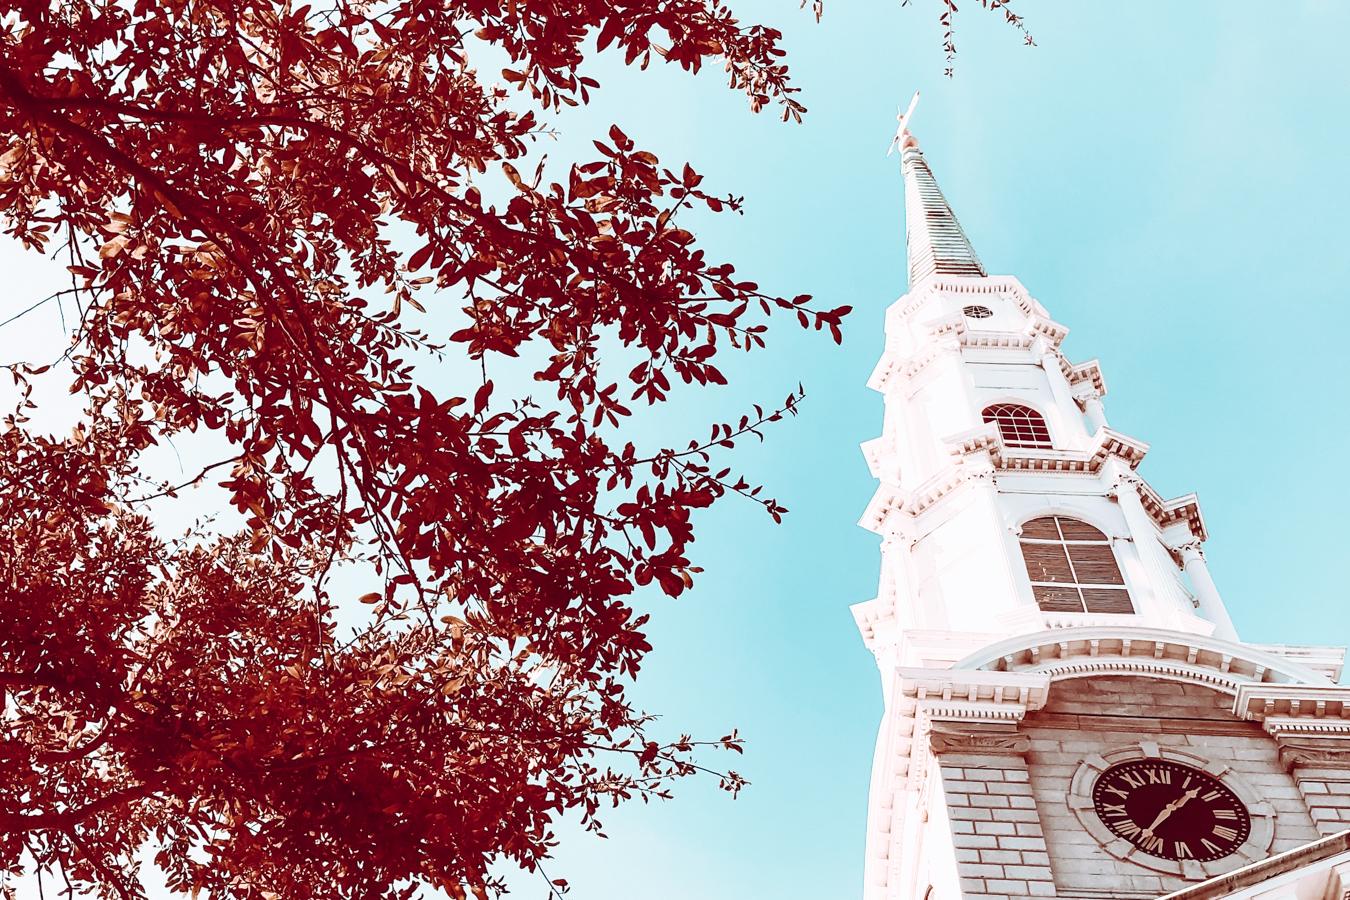 Church and trees in Savannah